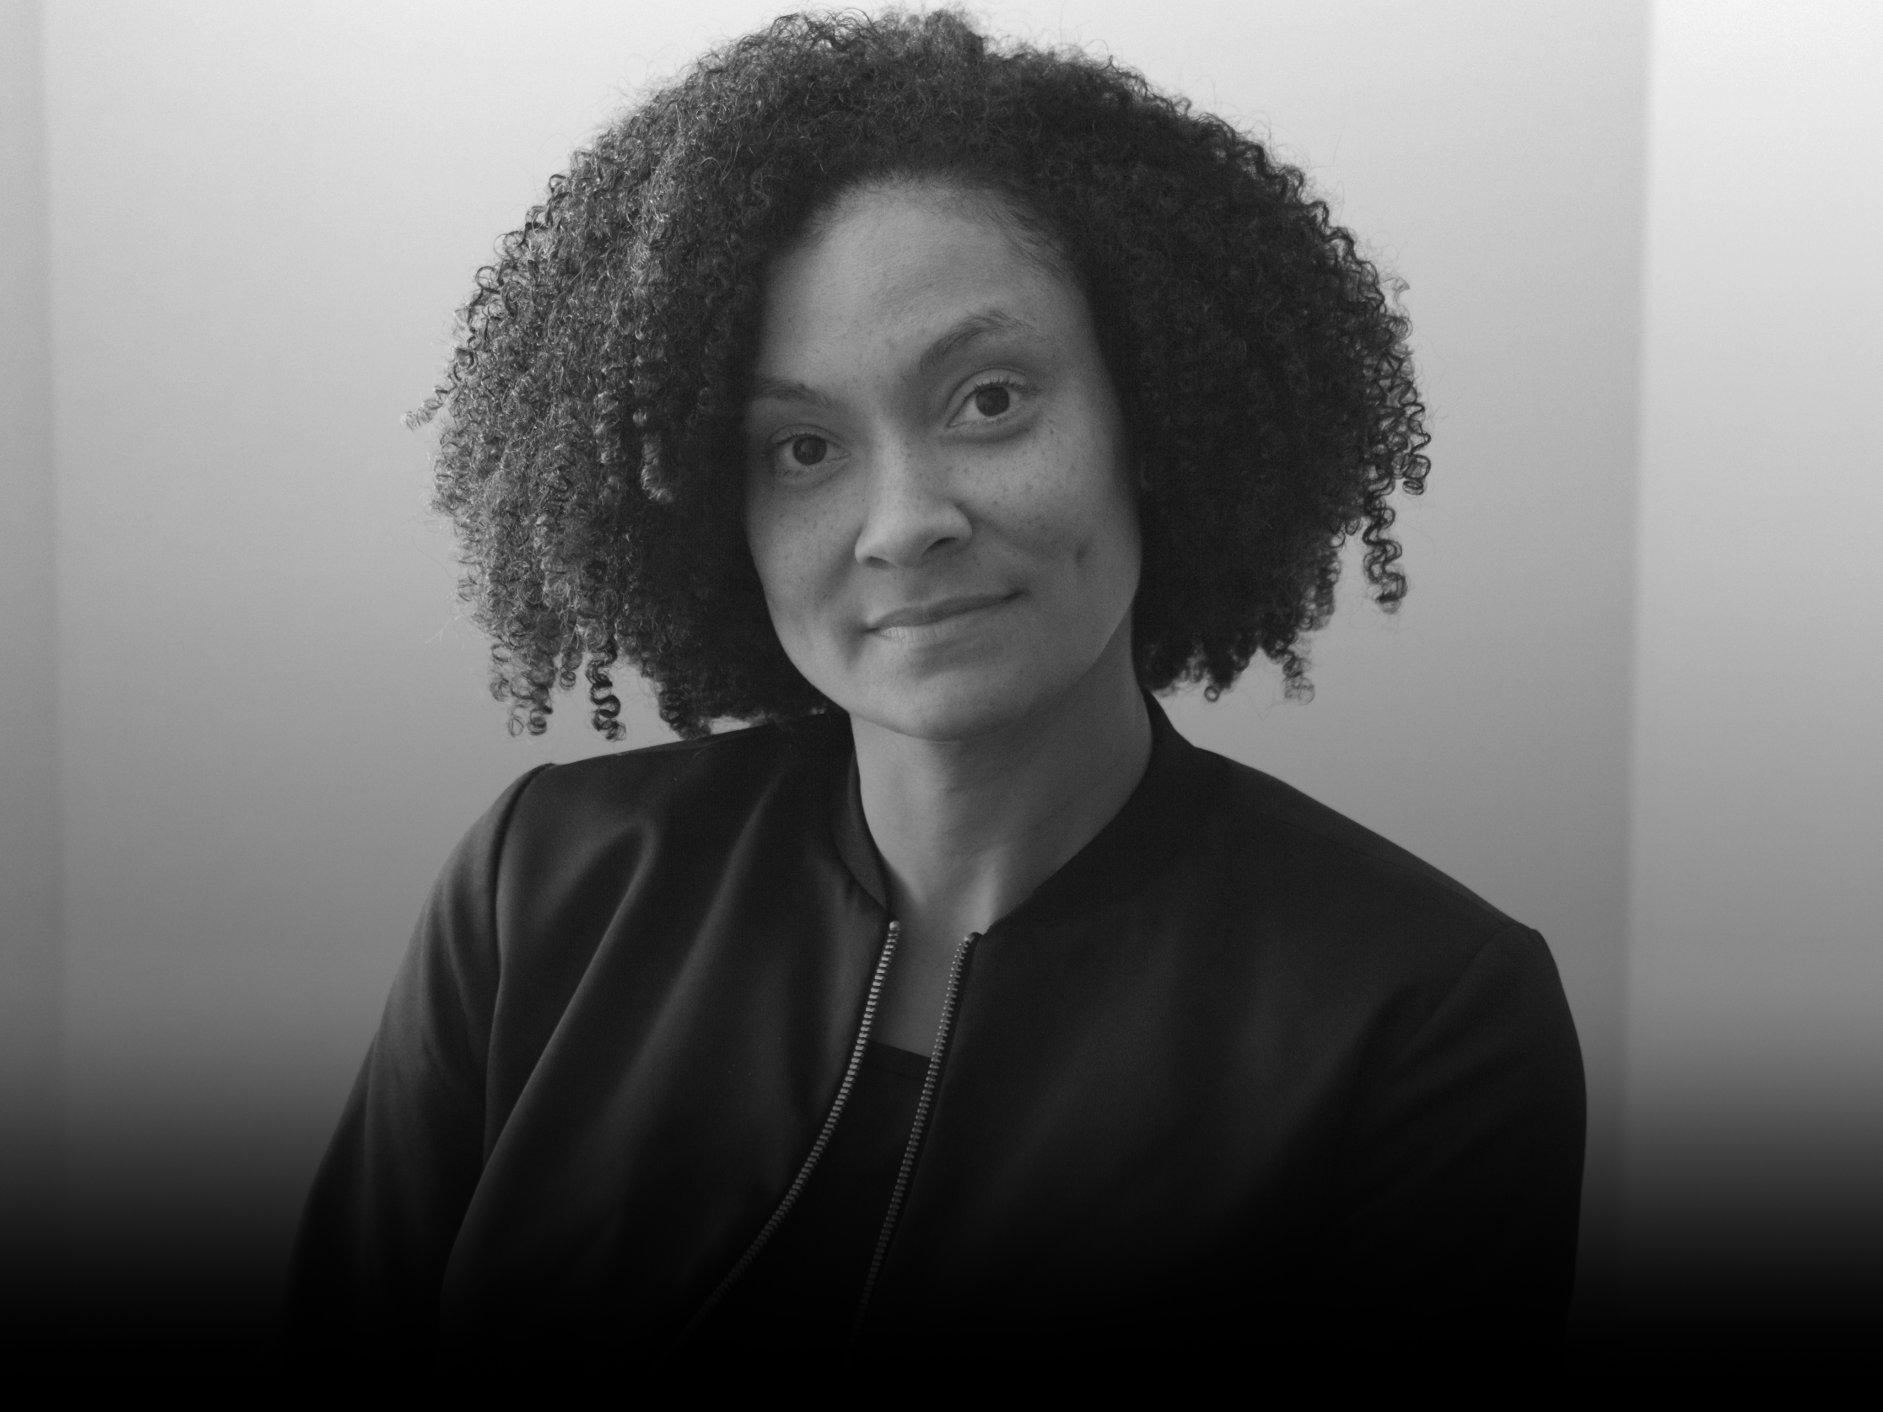 Image of Kira Kelly